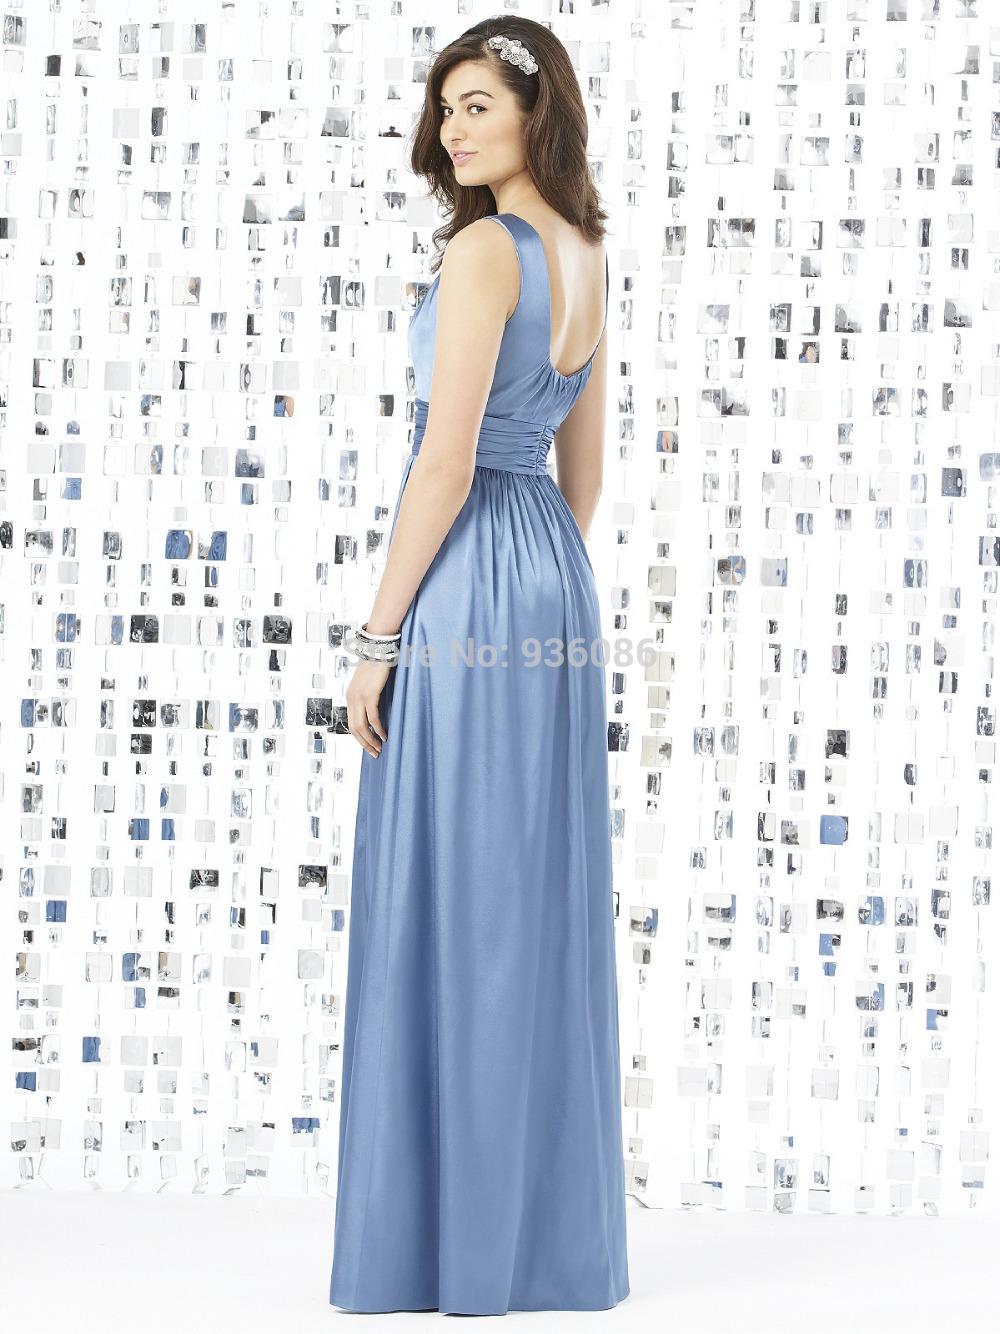 Mr k cheap dresses images woman art dress mr k cheap dresses images ombrellifo Gallery